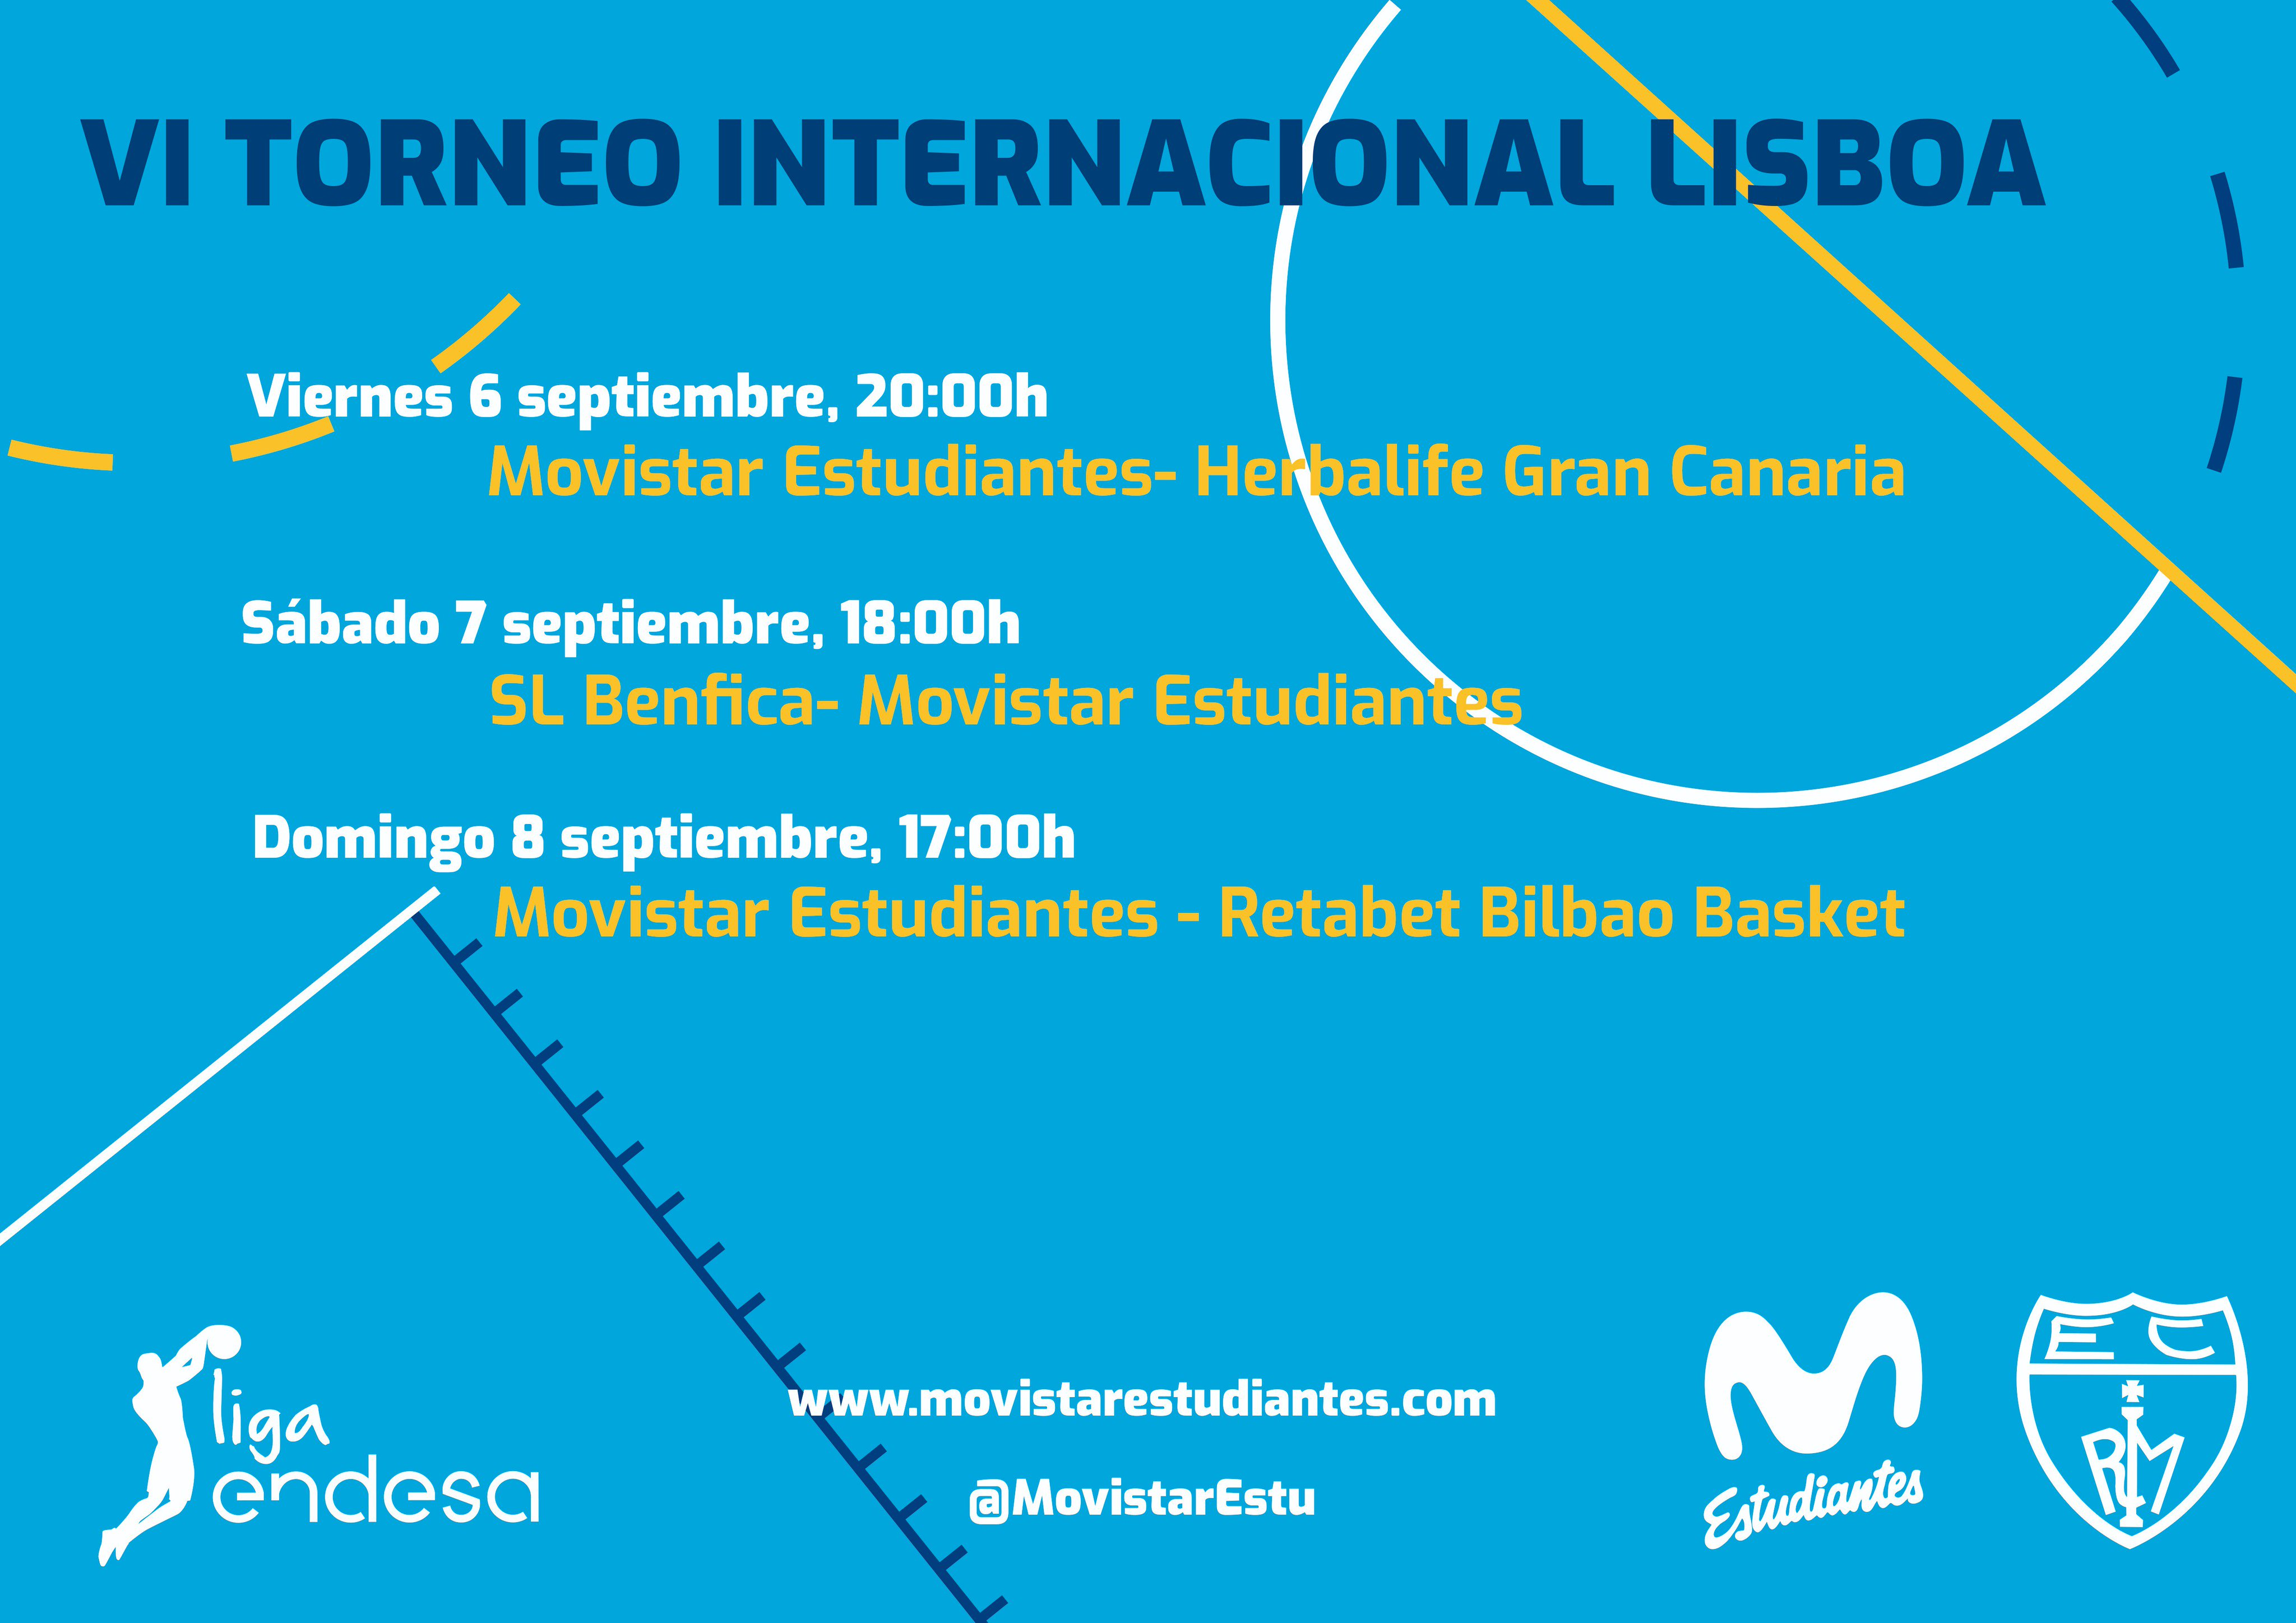 Torneo de Lisboa, triple ensayo para Movistar Estu